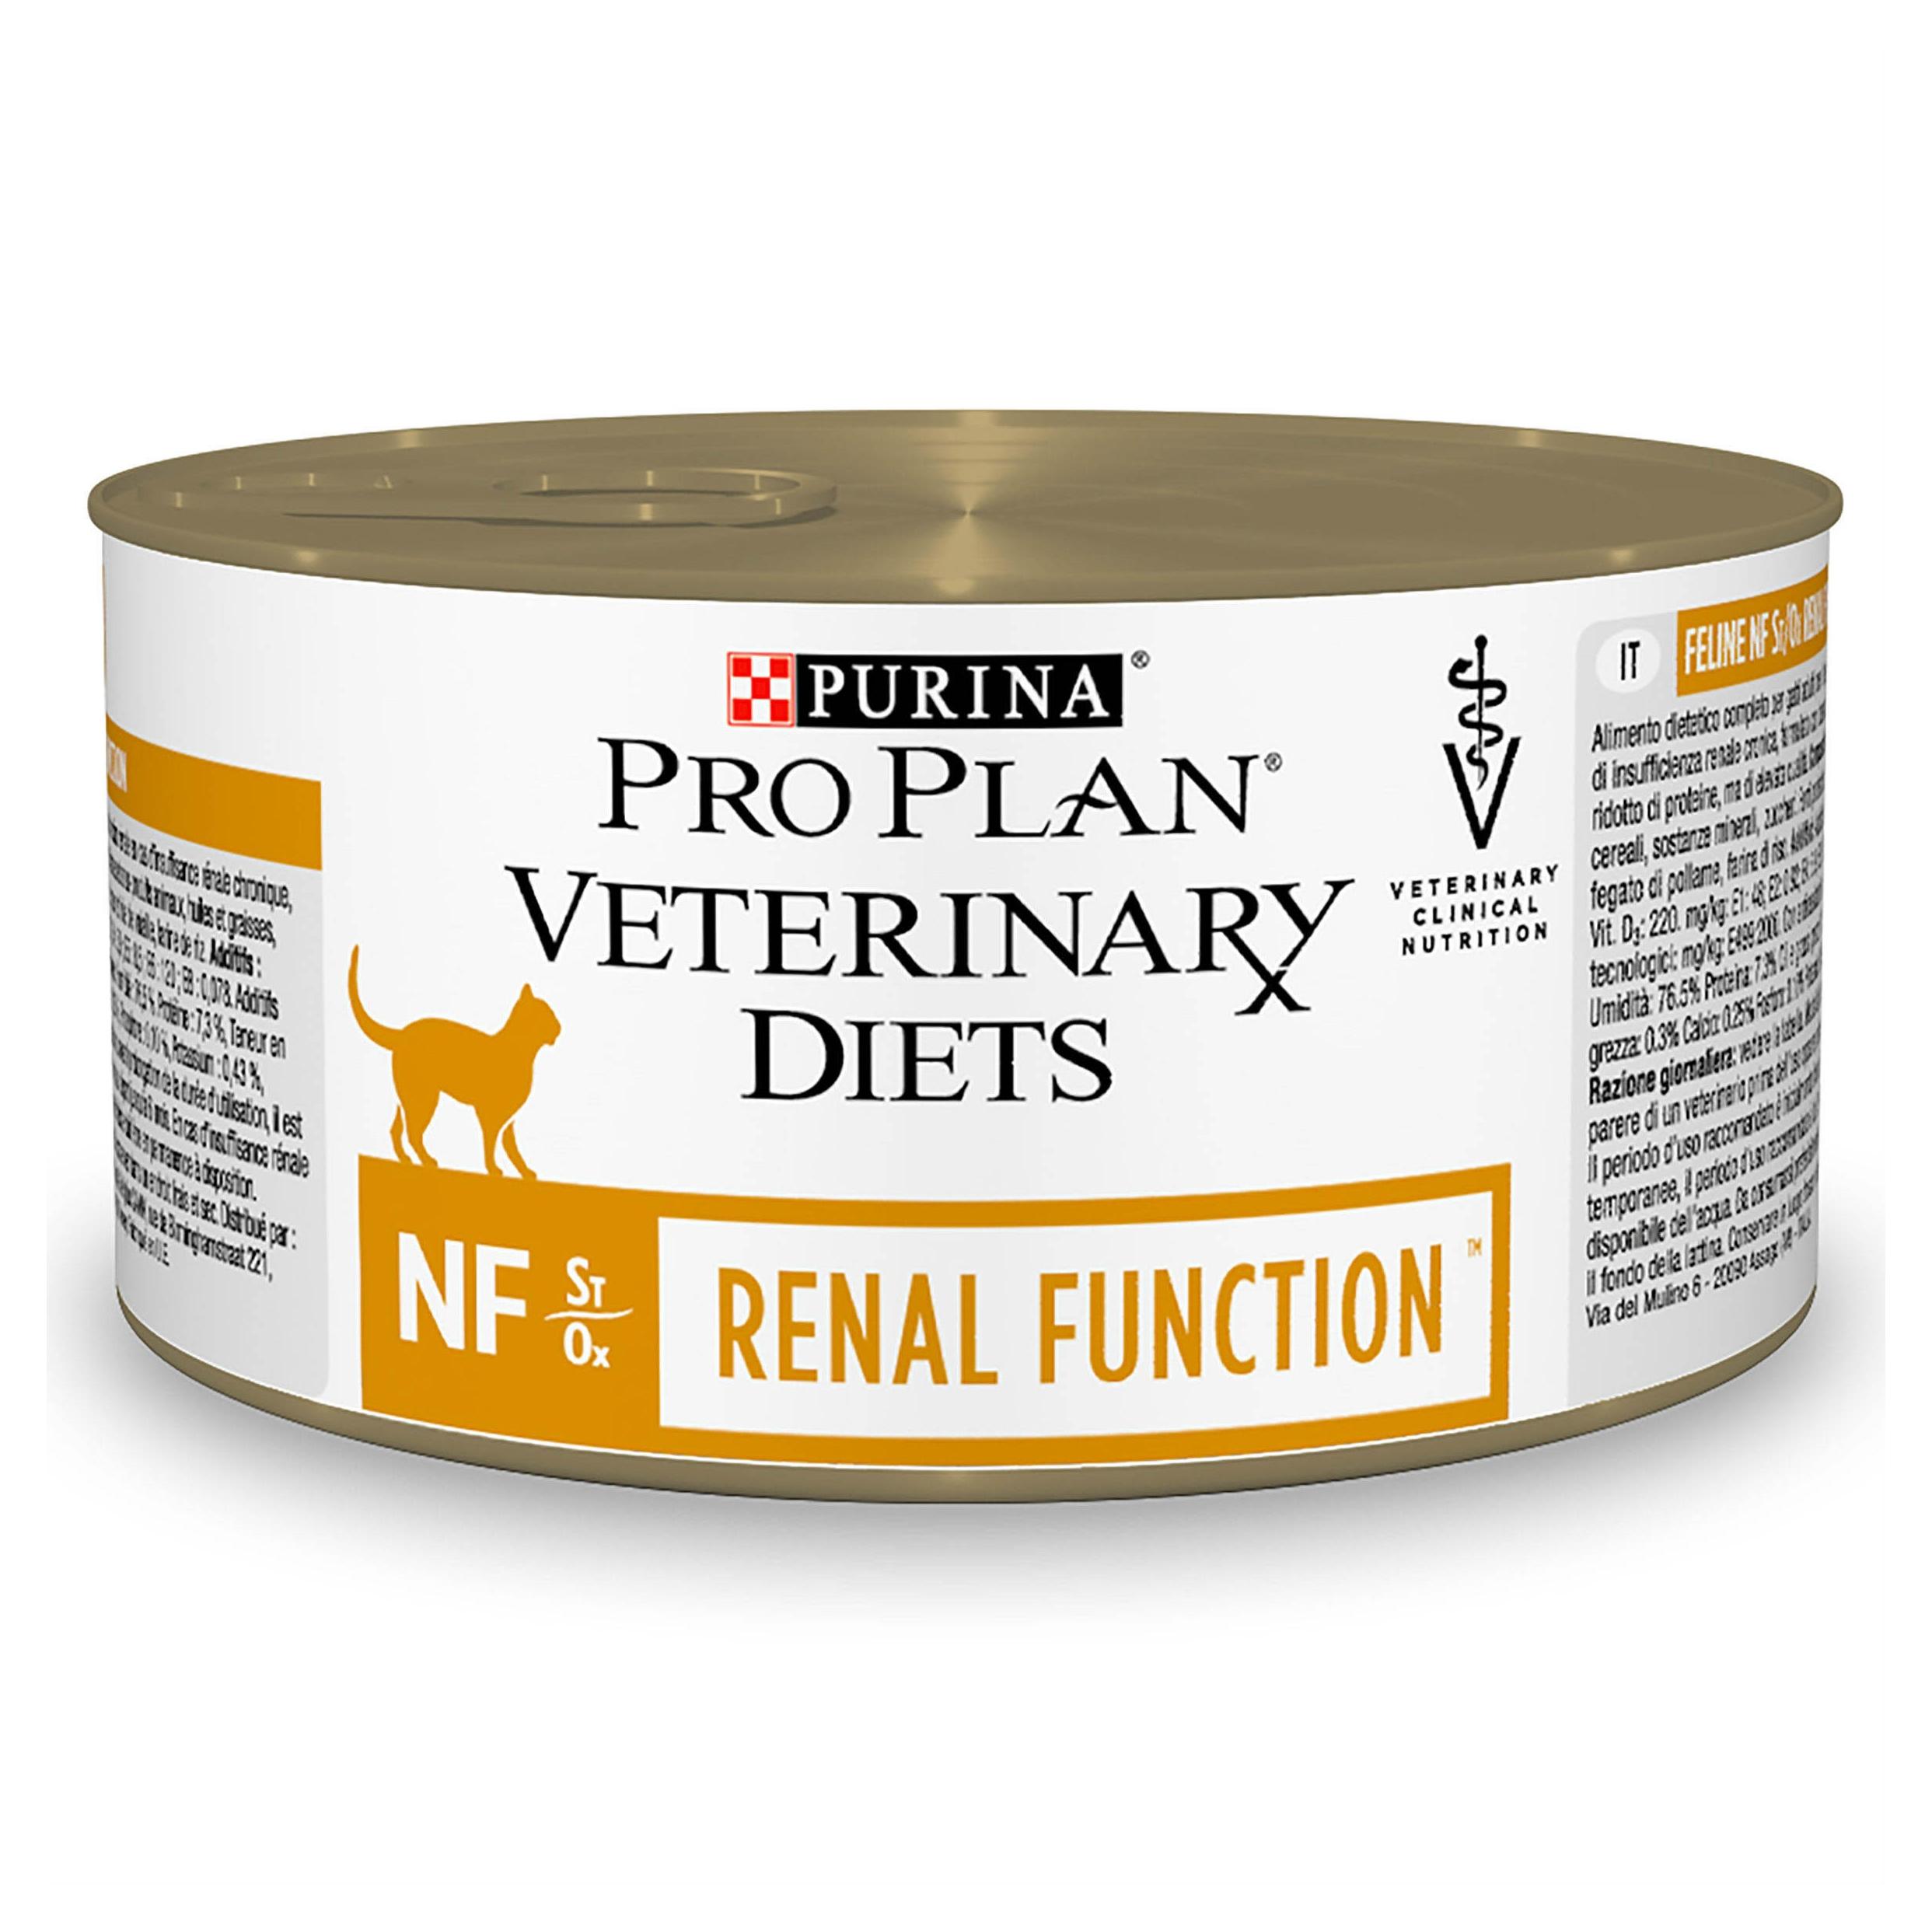 Purina Veterinary Diets Feline NF, Renal Function, 195 g imagine